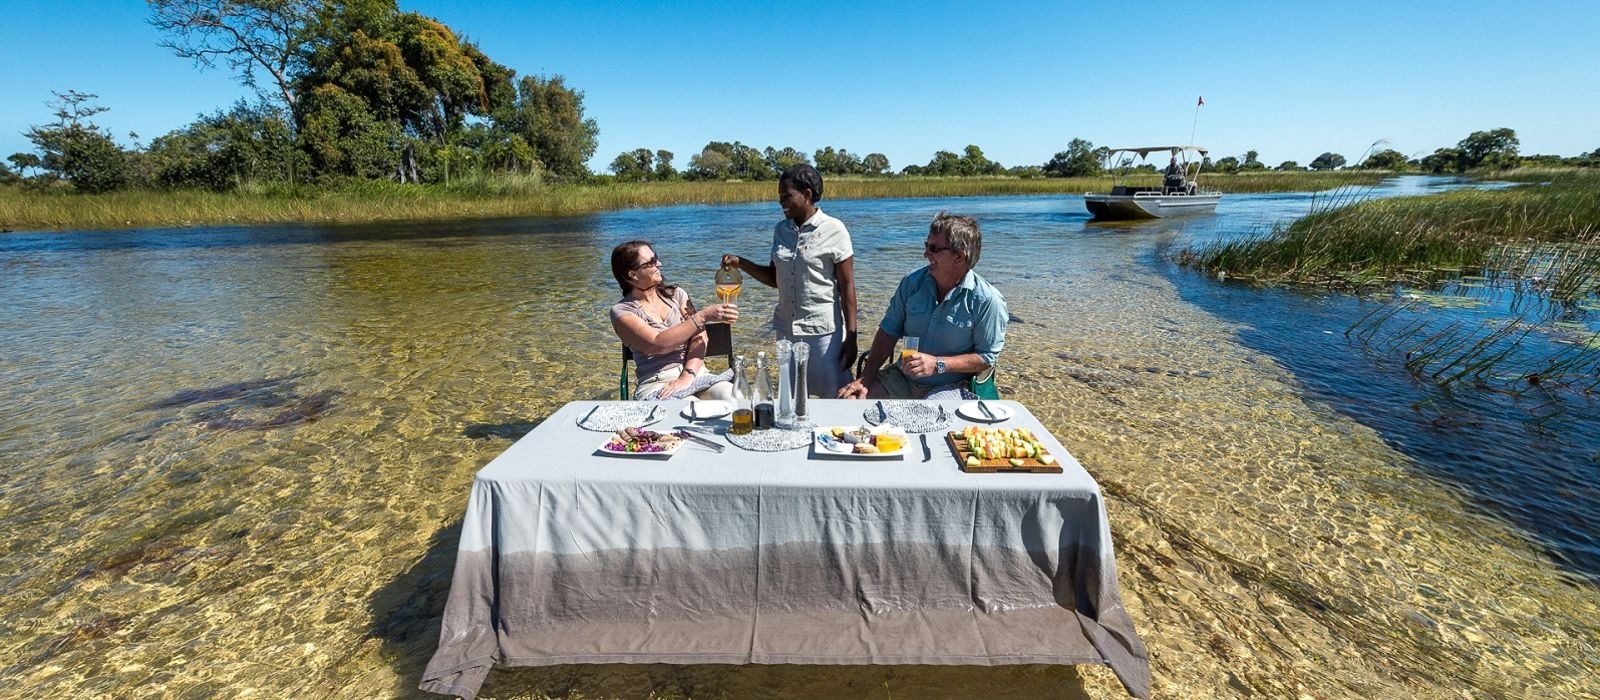 South Africa, Zimbabwe and Botswana: Wildlife and Waterfalls Tour Trip 1